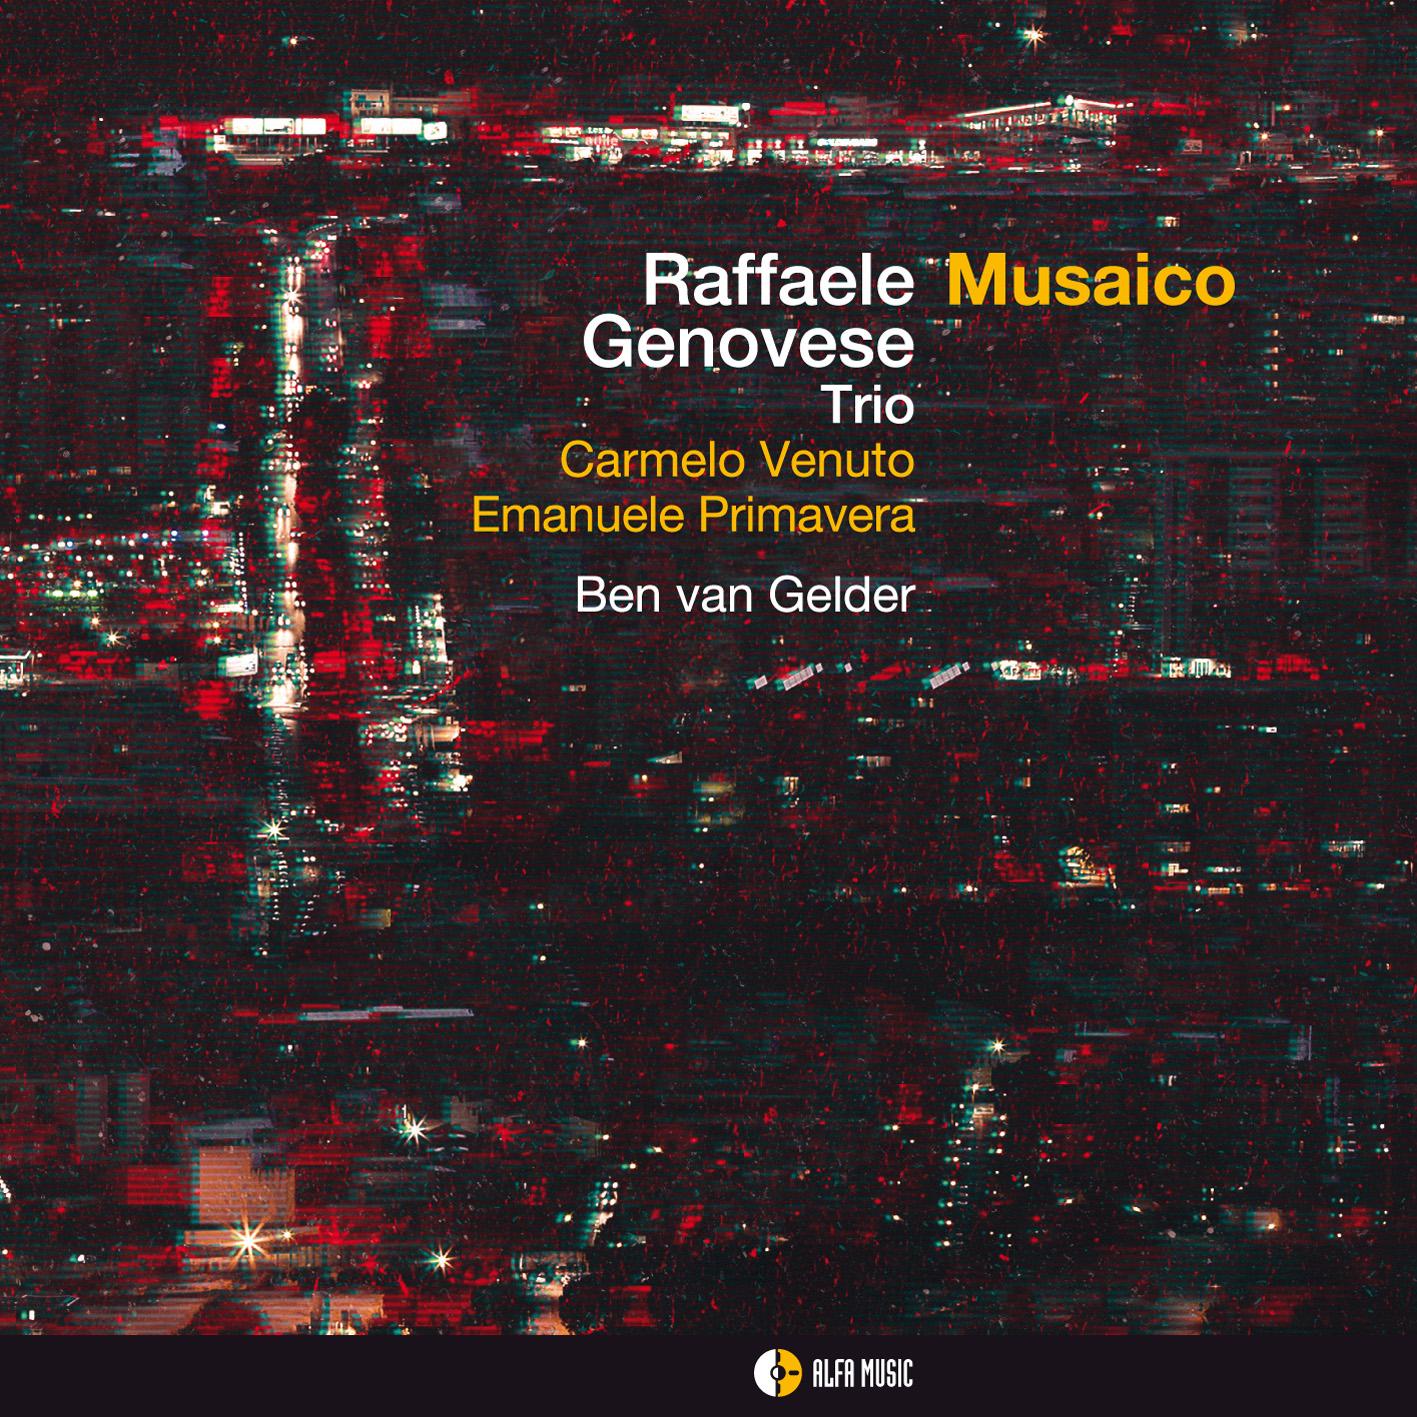 Raffaele Genovese Trio</br>Musaico</br>Alfa Music, 2016